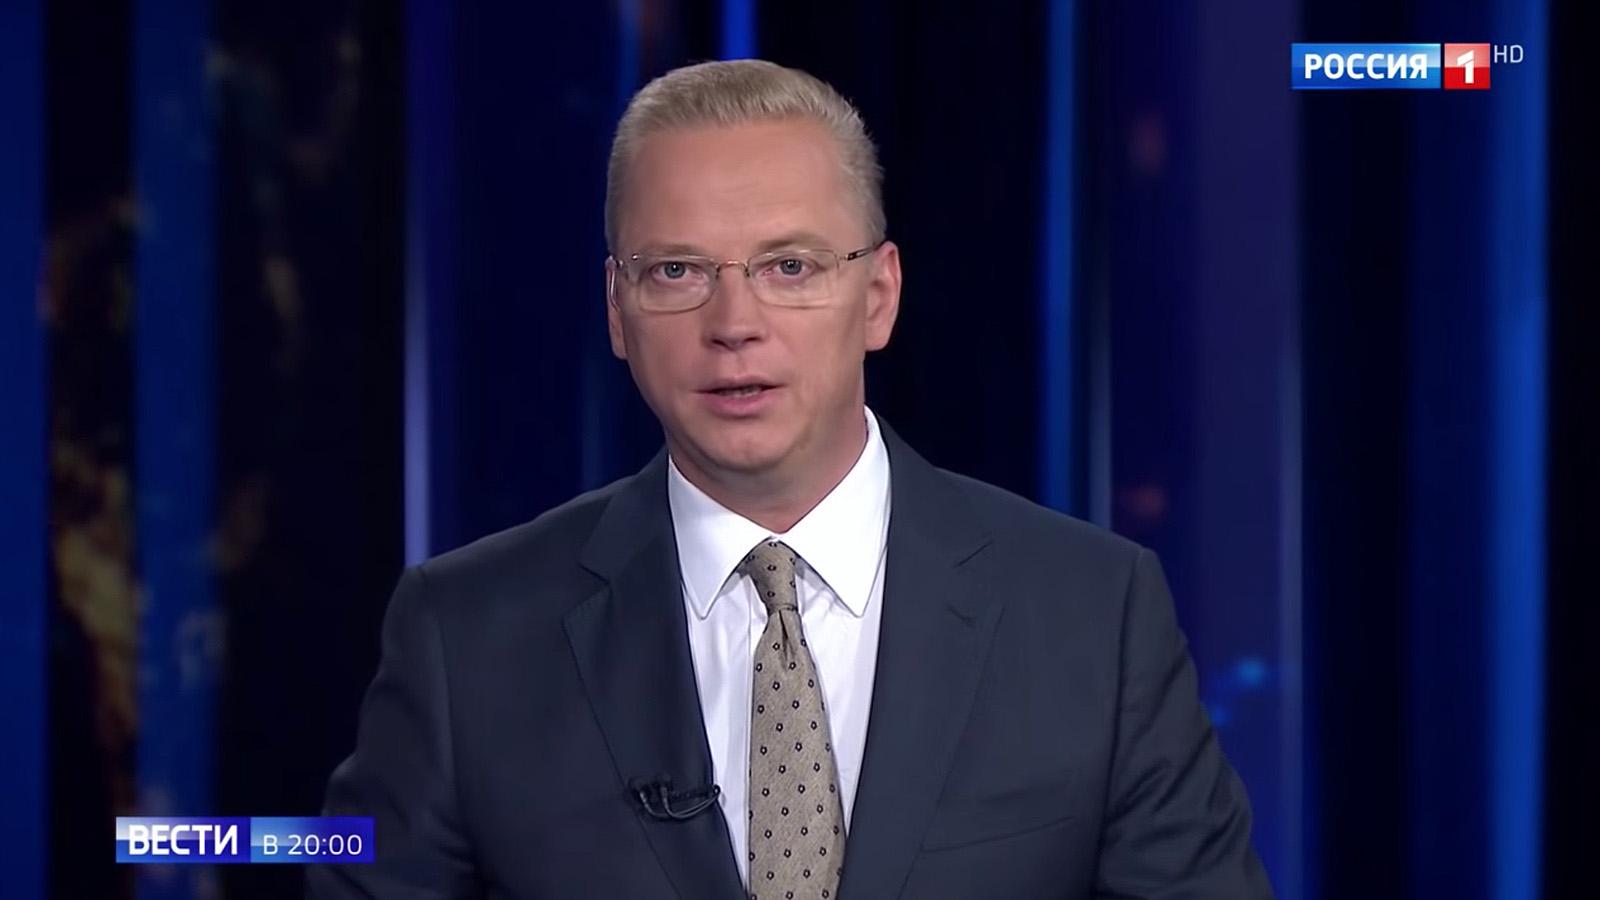 NCS_Russia-1-Vesti-Studio_0007